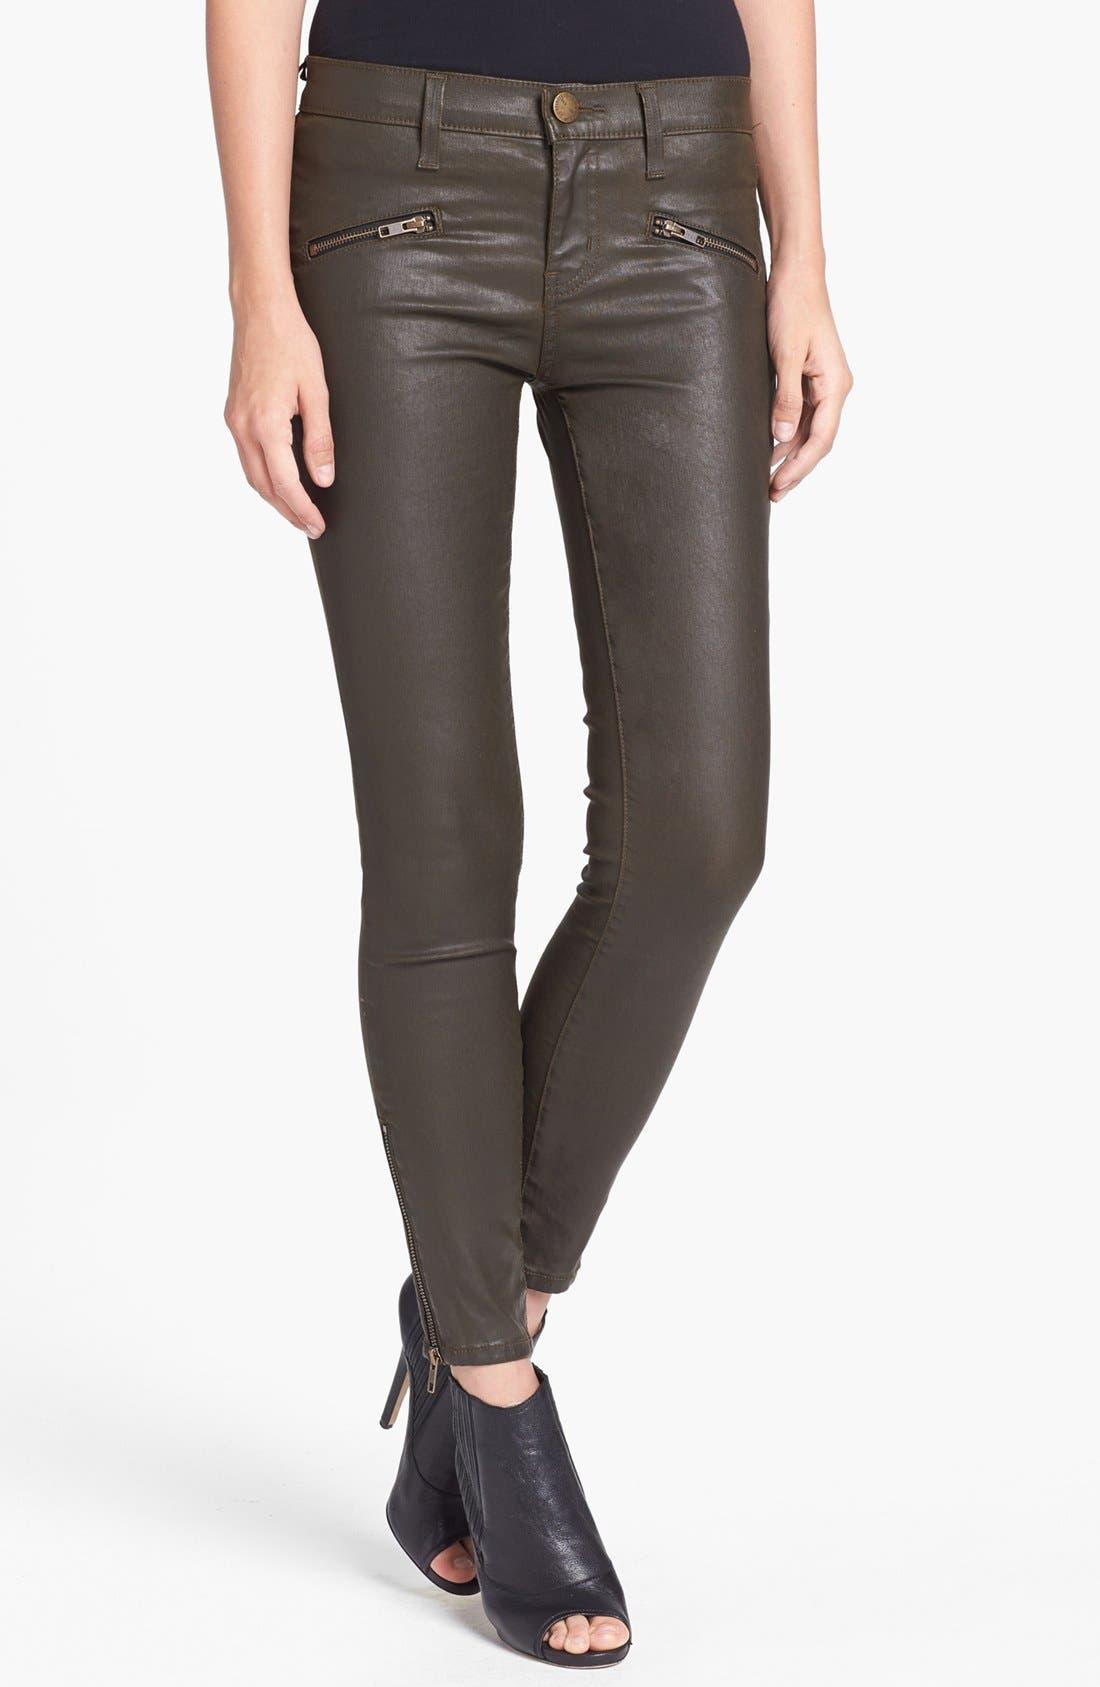 Main Image - Current/Elliott 'The Soho' Coated Skinny Jeans